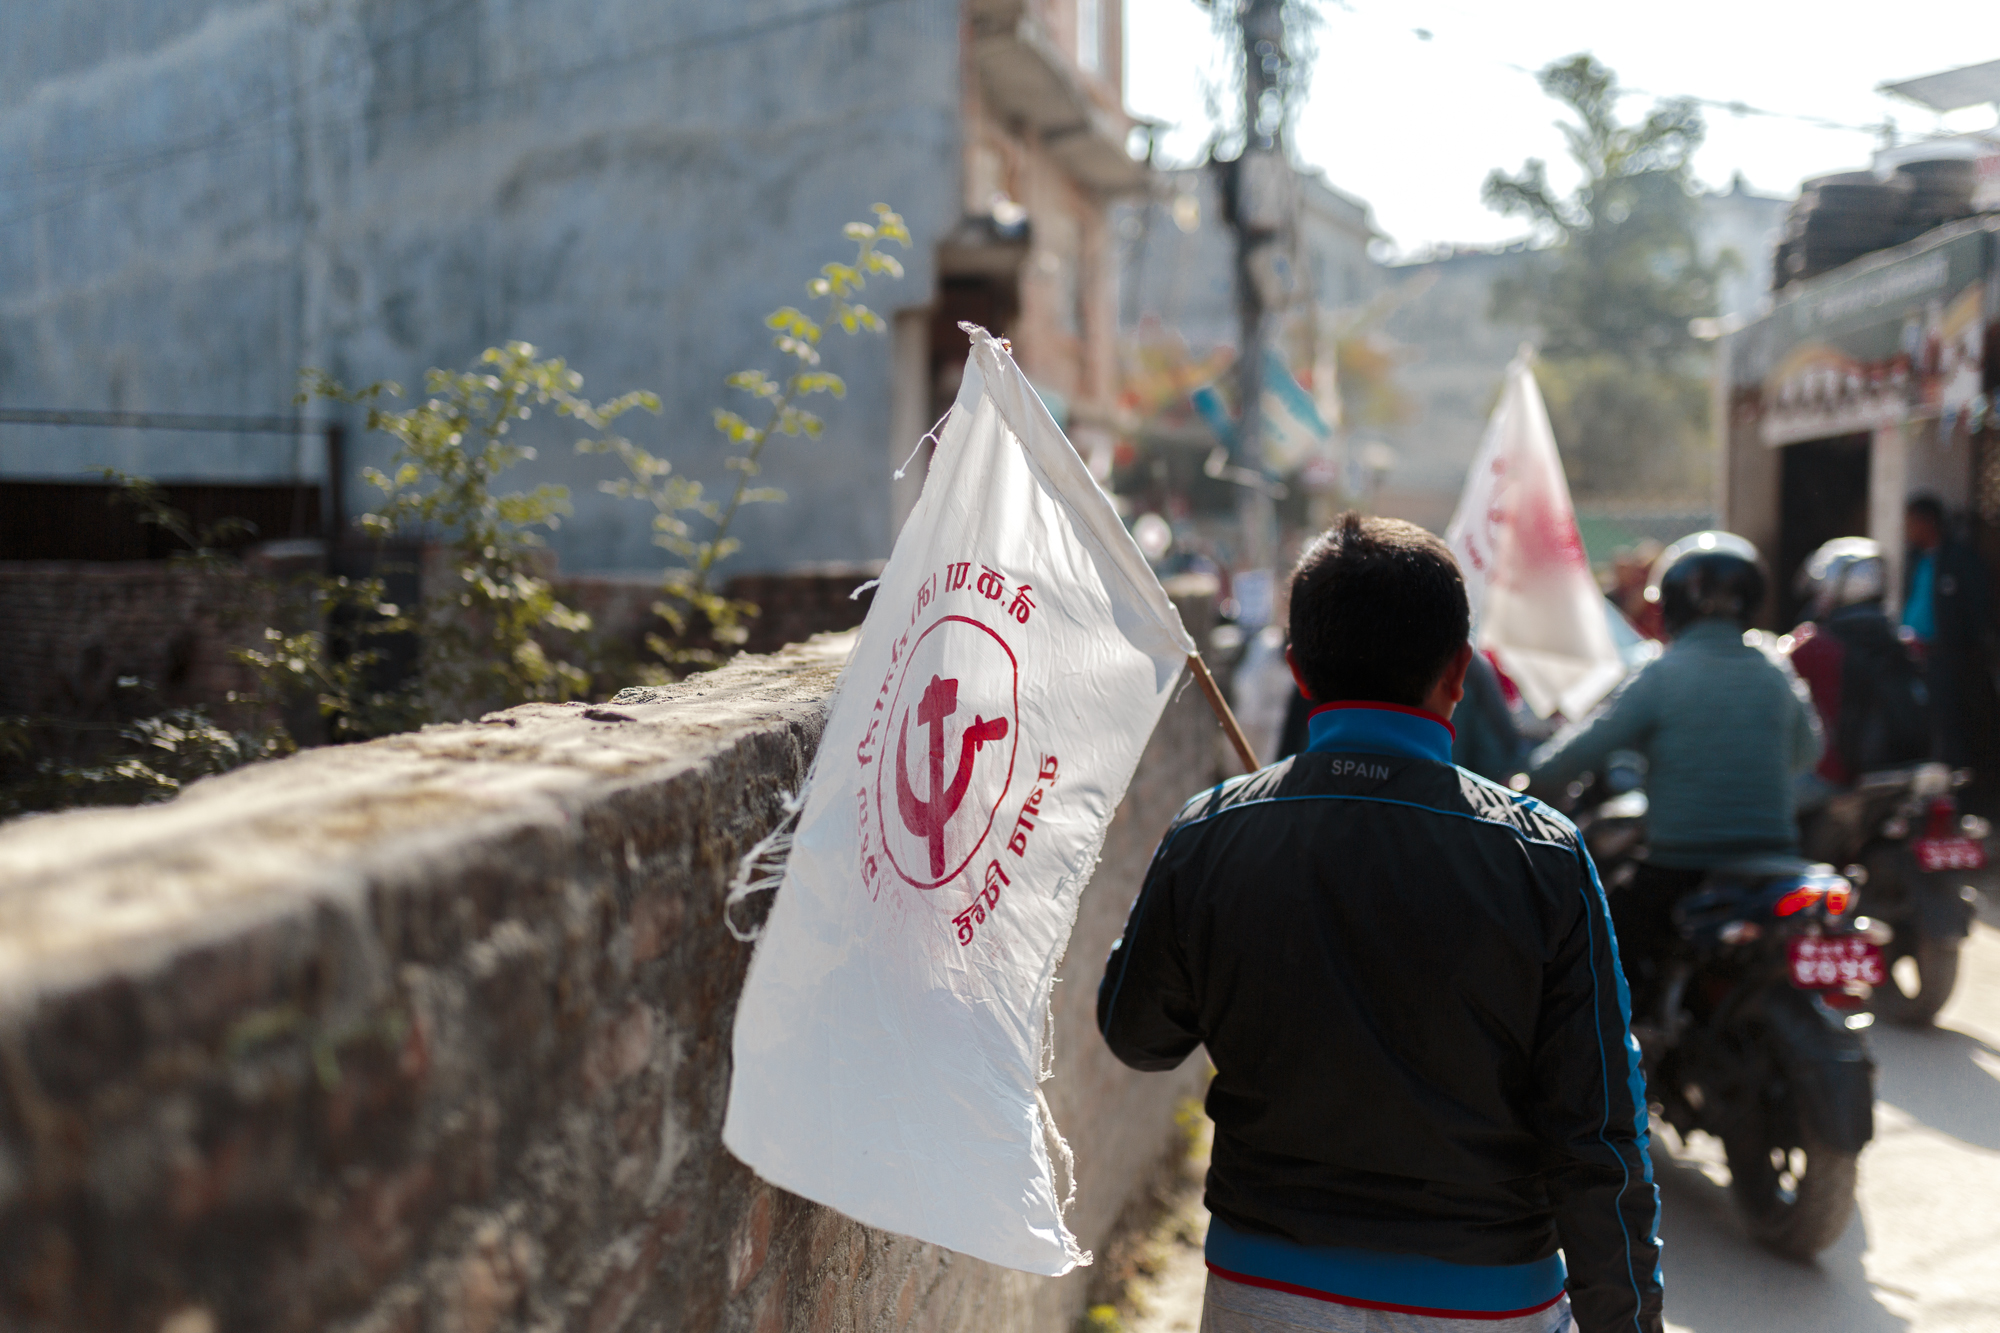 Copy of Copy of Communist procession, Kathmandu, Nepal, 2017